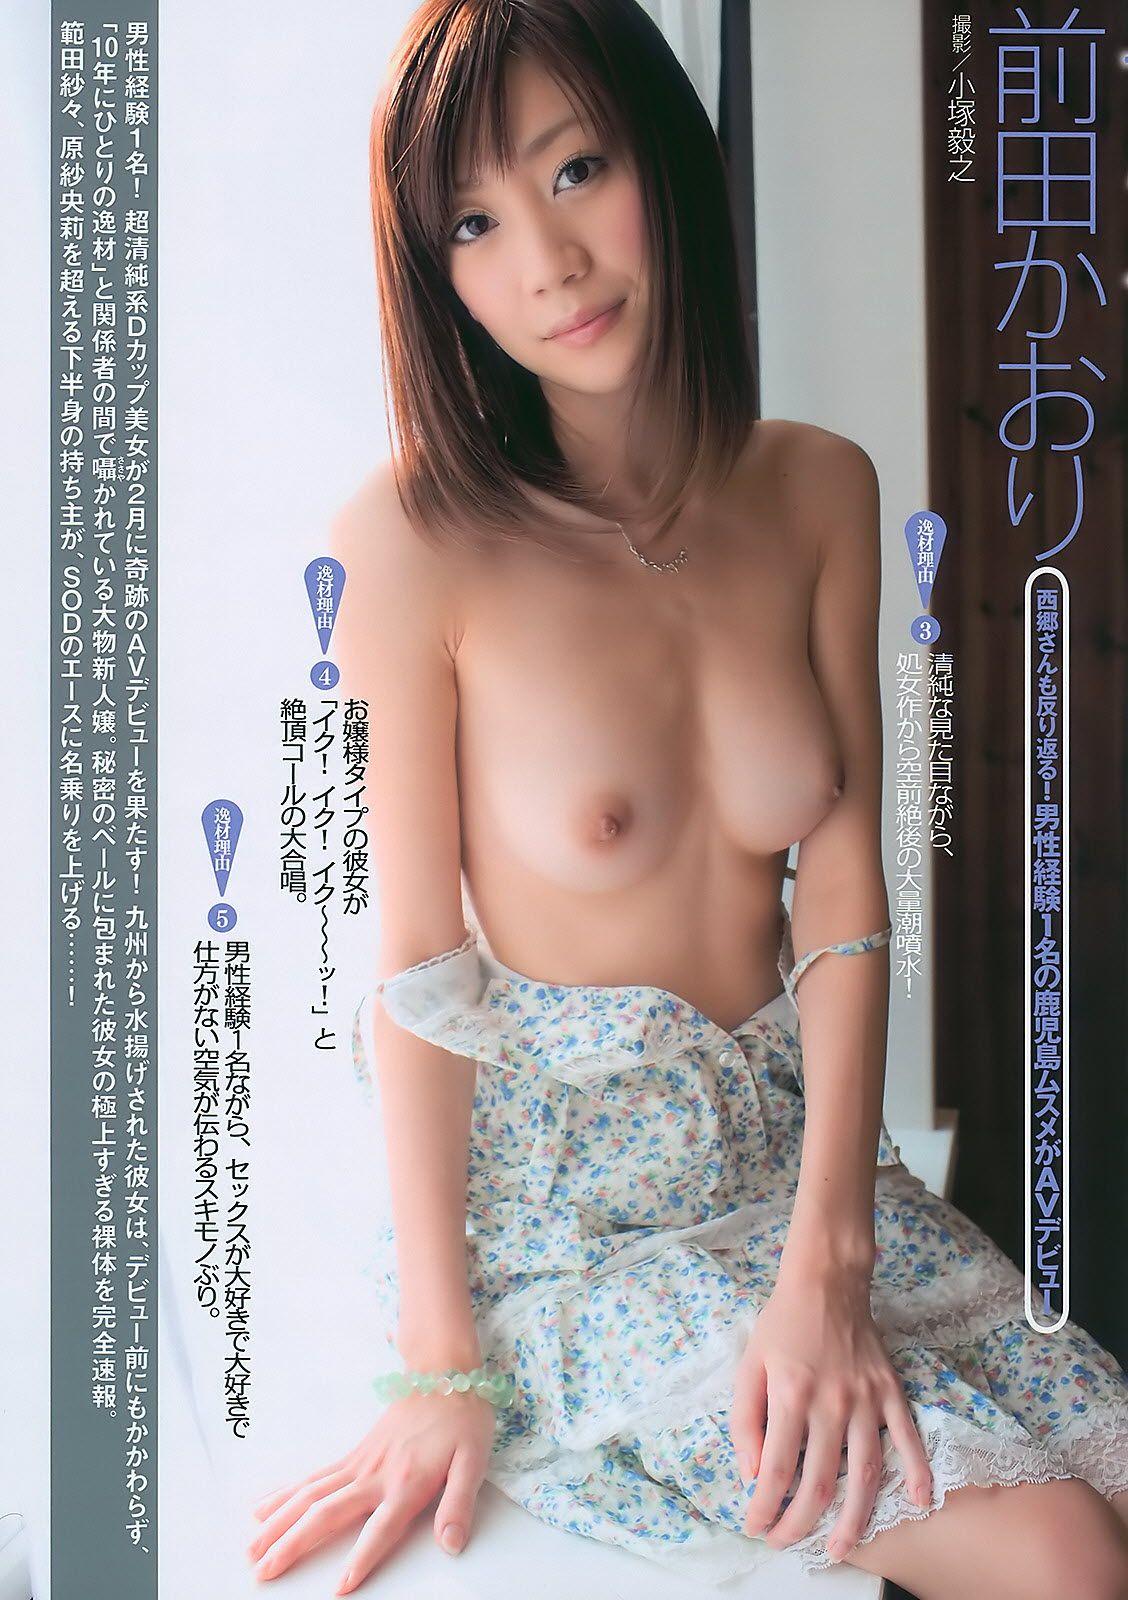 KAORI.の画像 p1_30